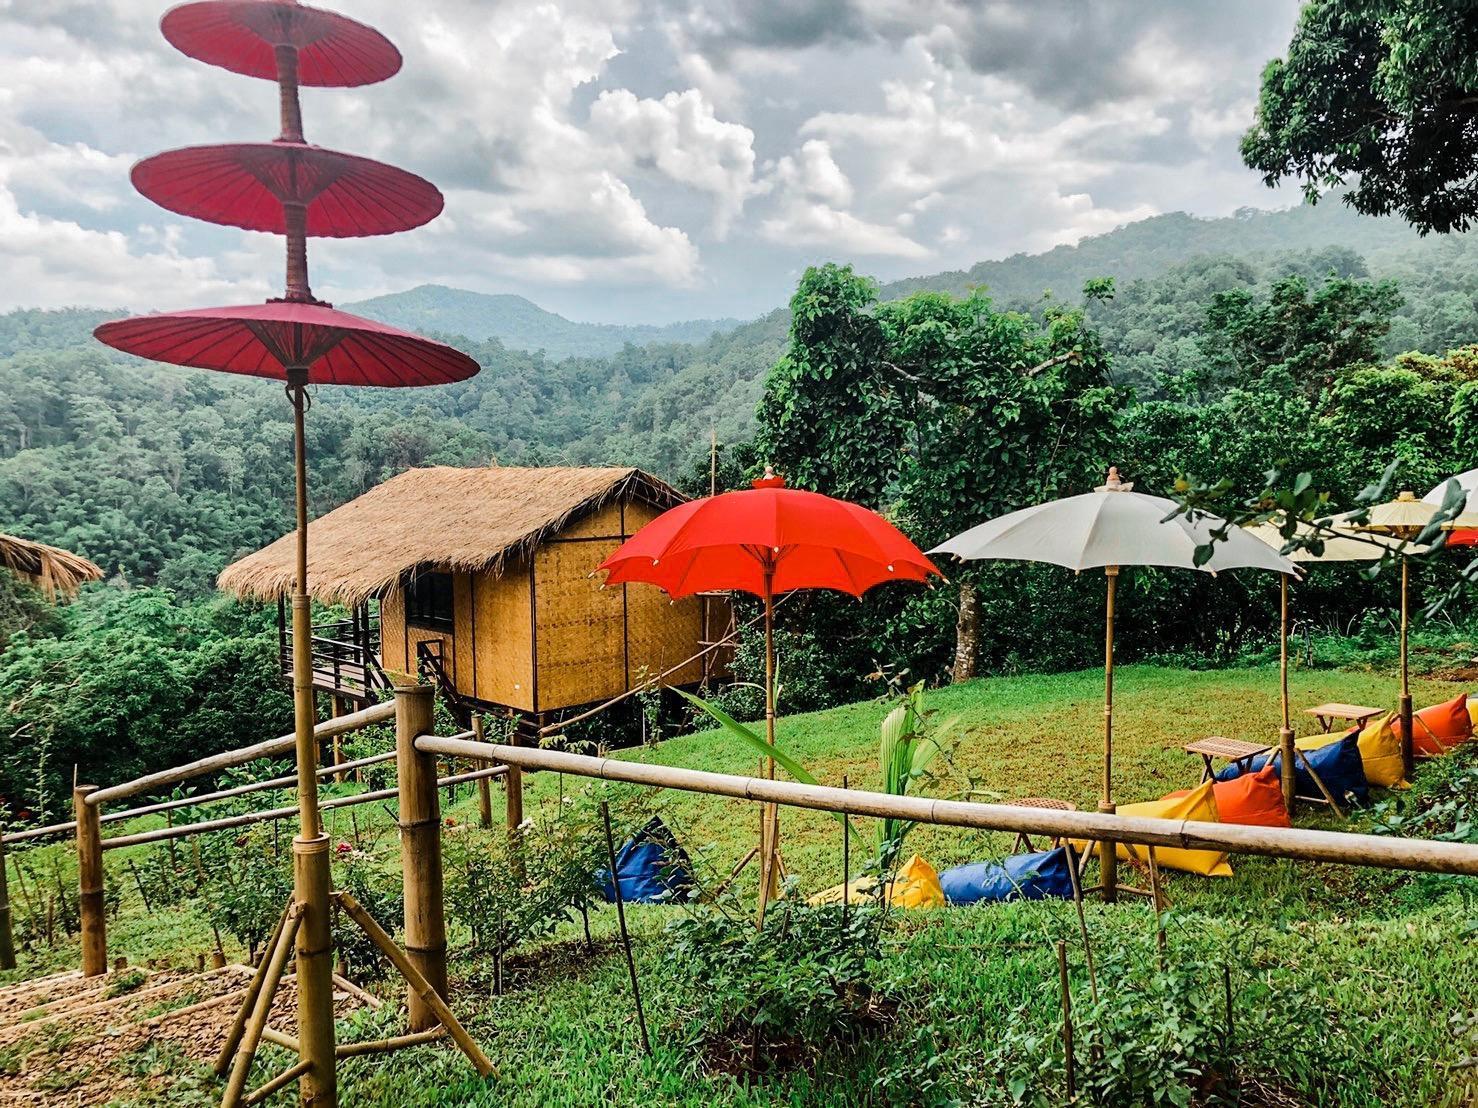 Hughome Valley ChiangDao